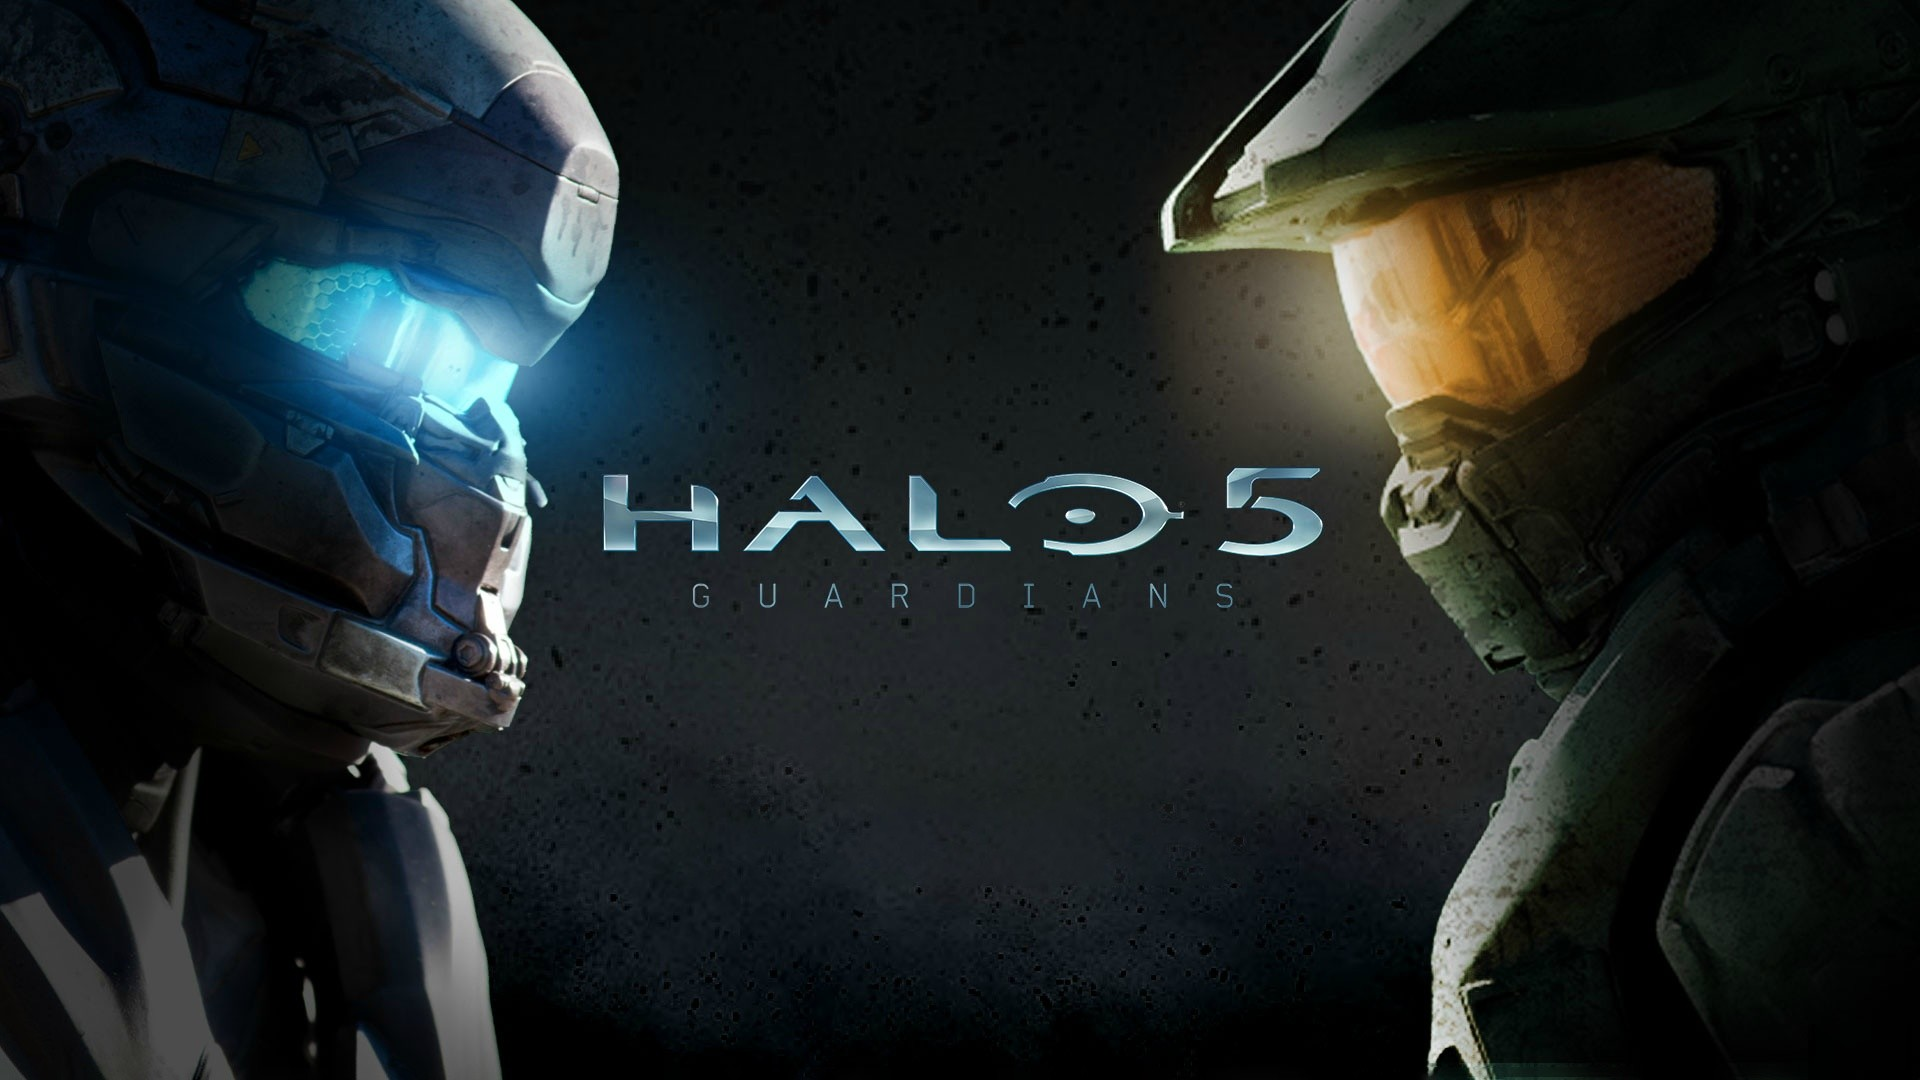 Nieuwe Halo 5 DLC teaser, Halo Wars 2 images uitgebracht .